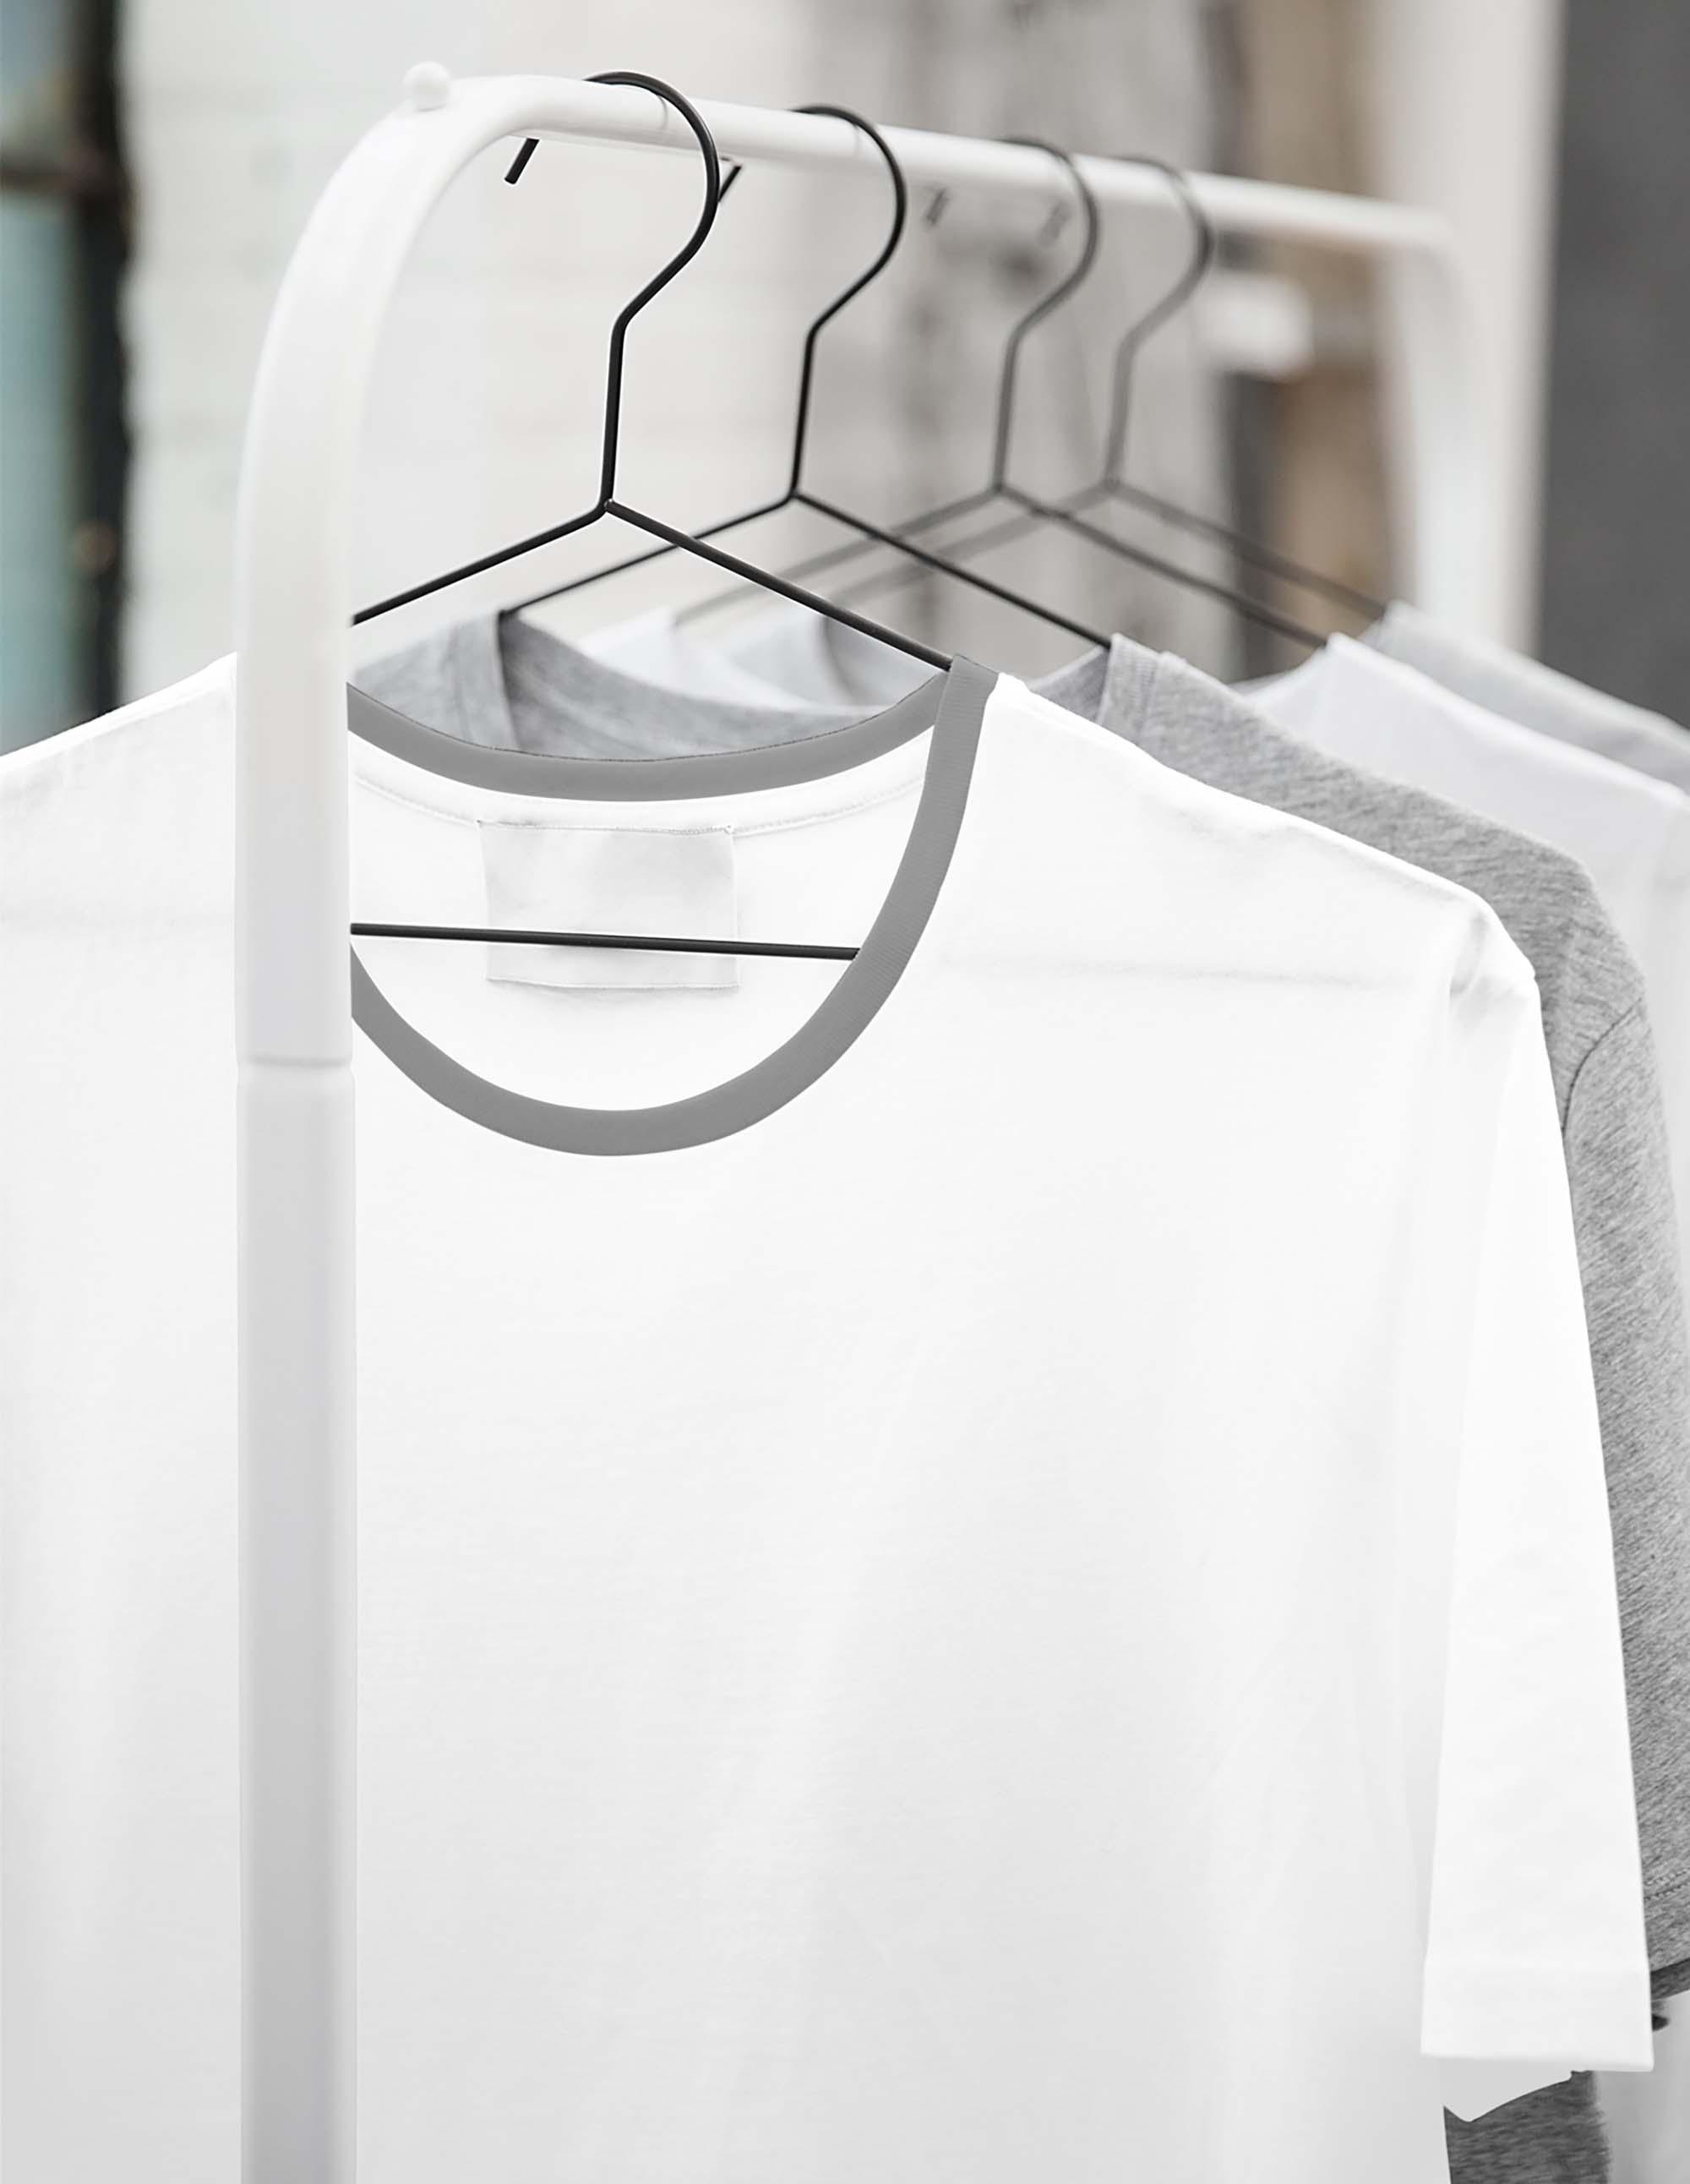 Hanged T-Shirt Mockup 2